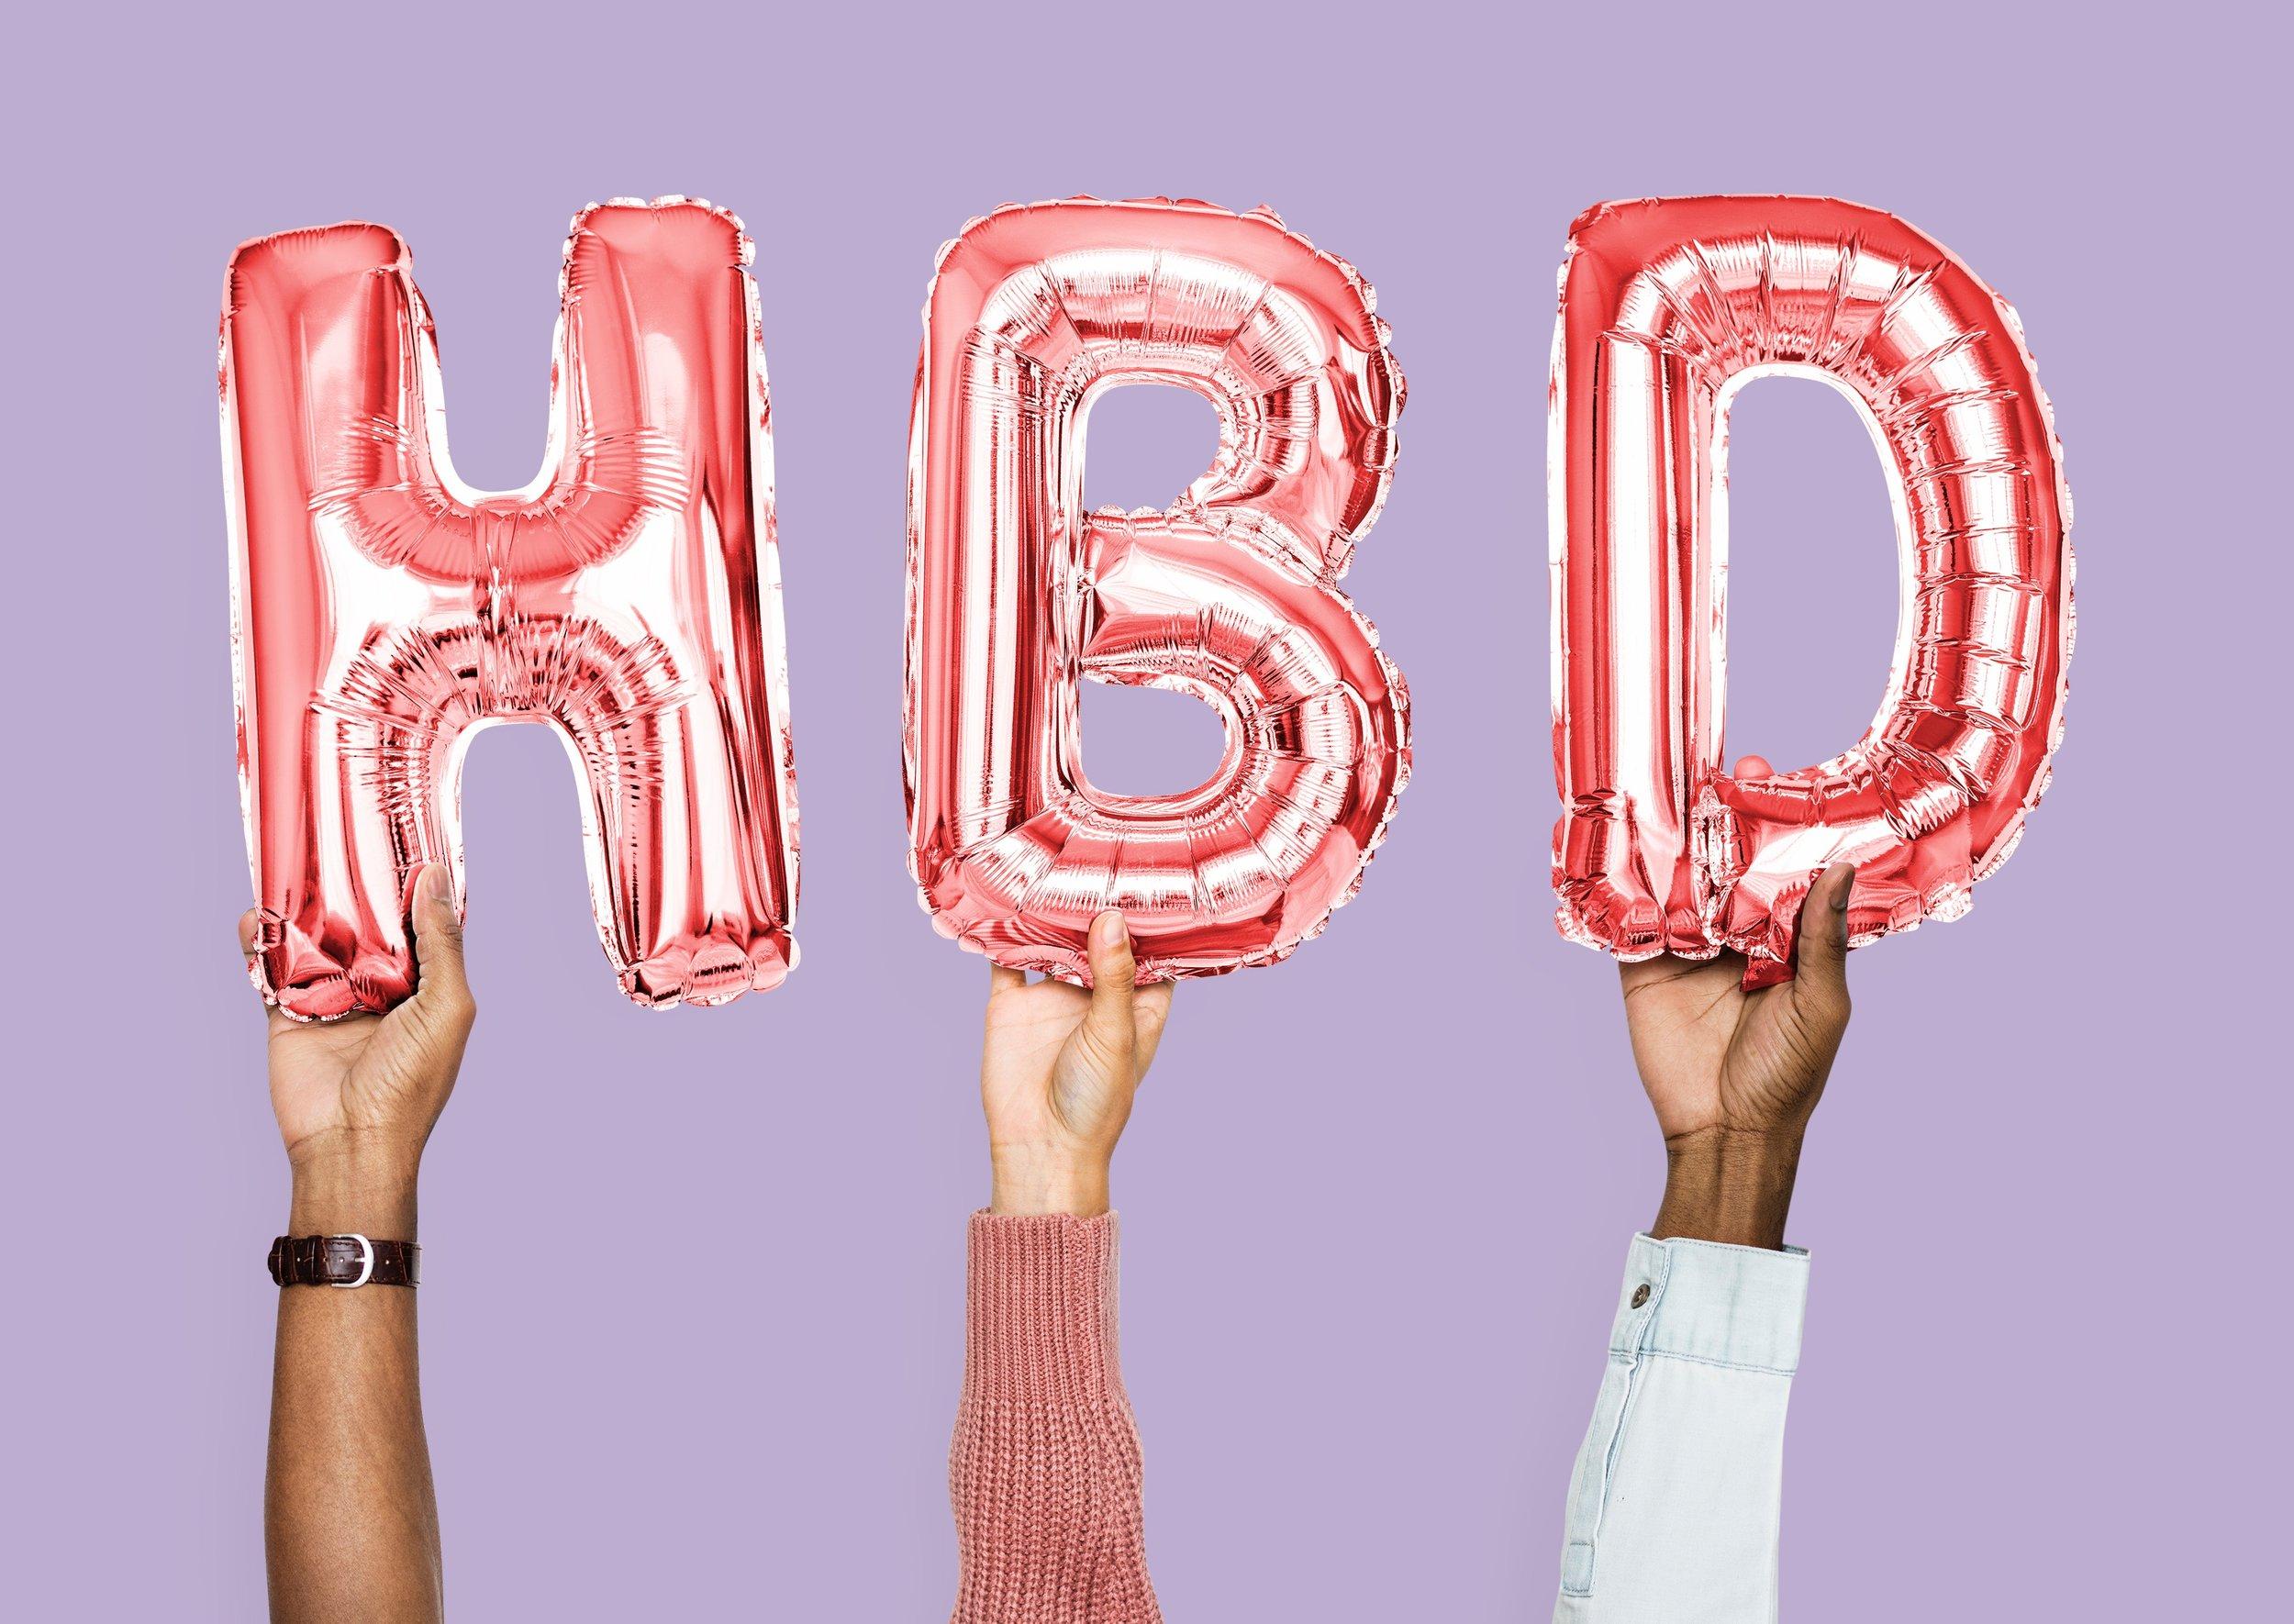 alphabet-balloons-birthday-1271134 (1).jpg